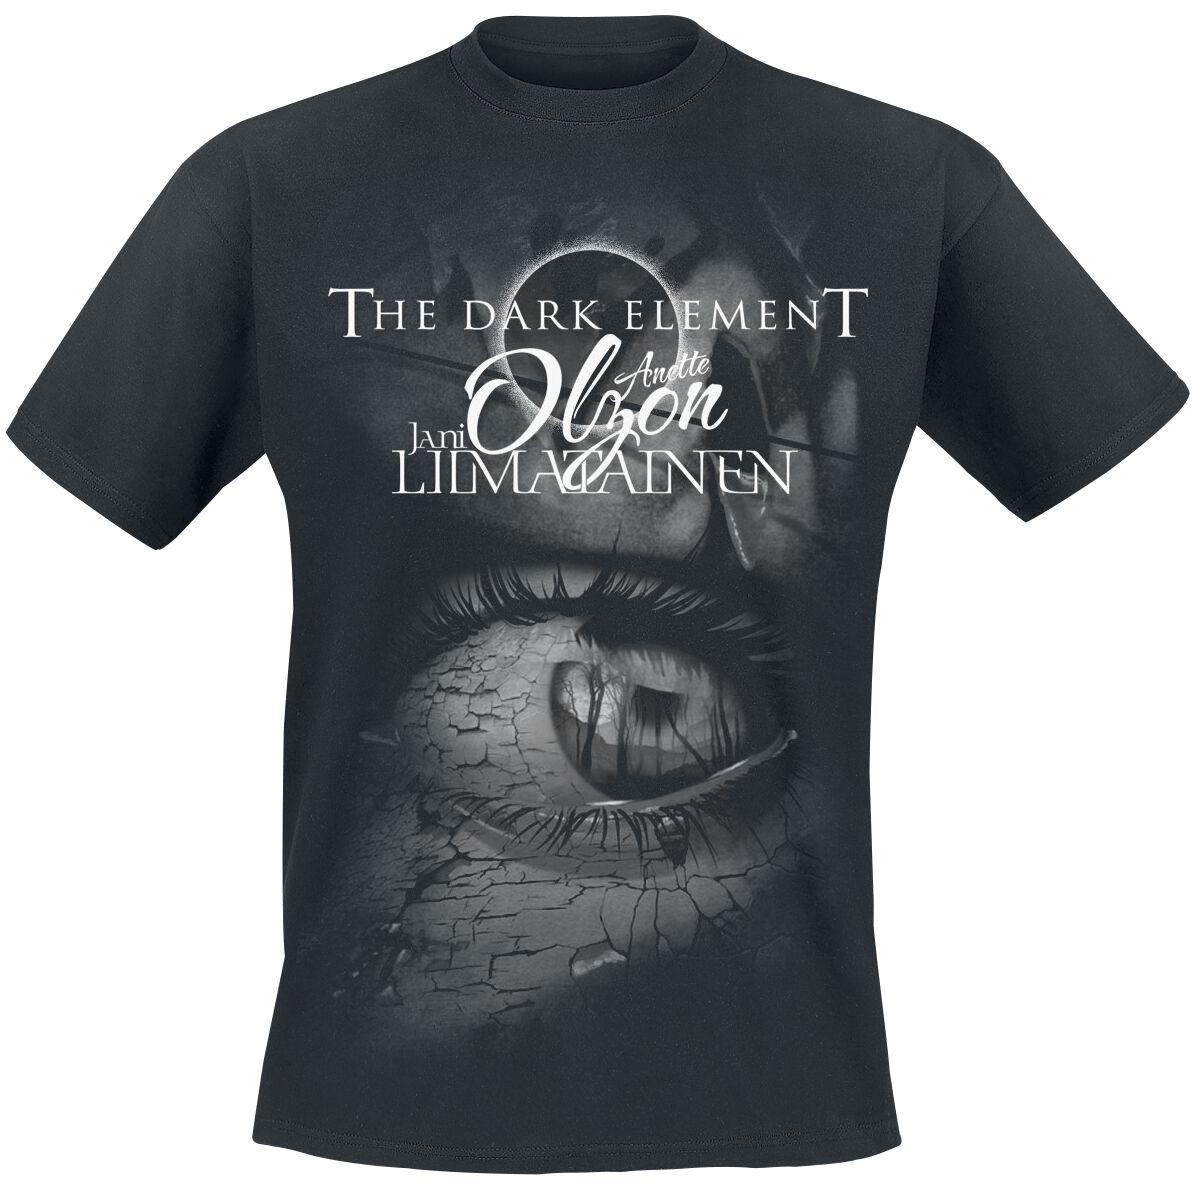 Zespoły - Koszulki - T-Shirt Dark Element, The (feat. Anette Olzon) The dark element T-Shirt czarny - 369941